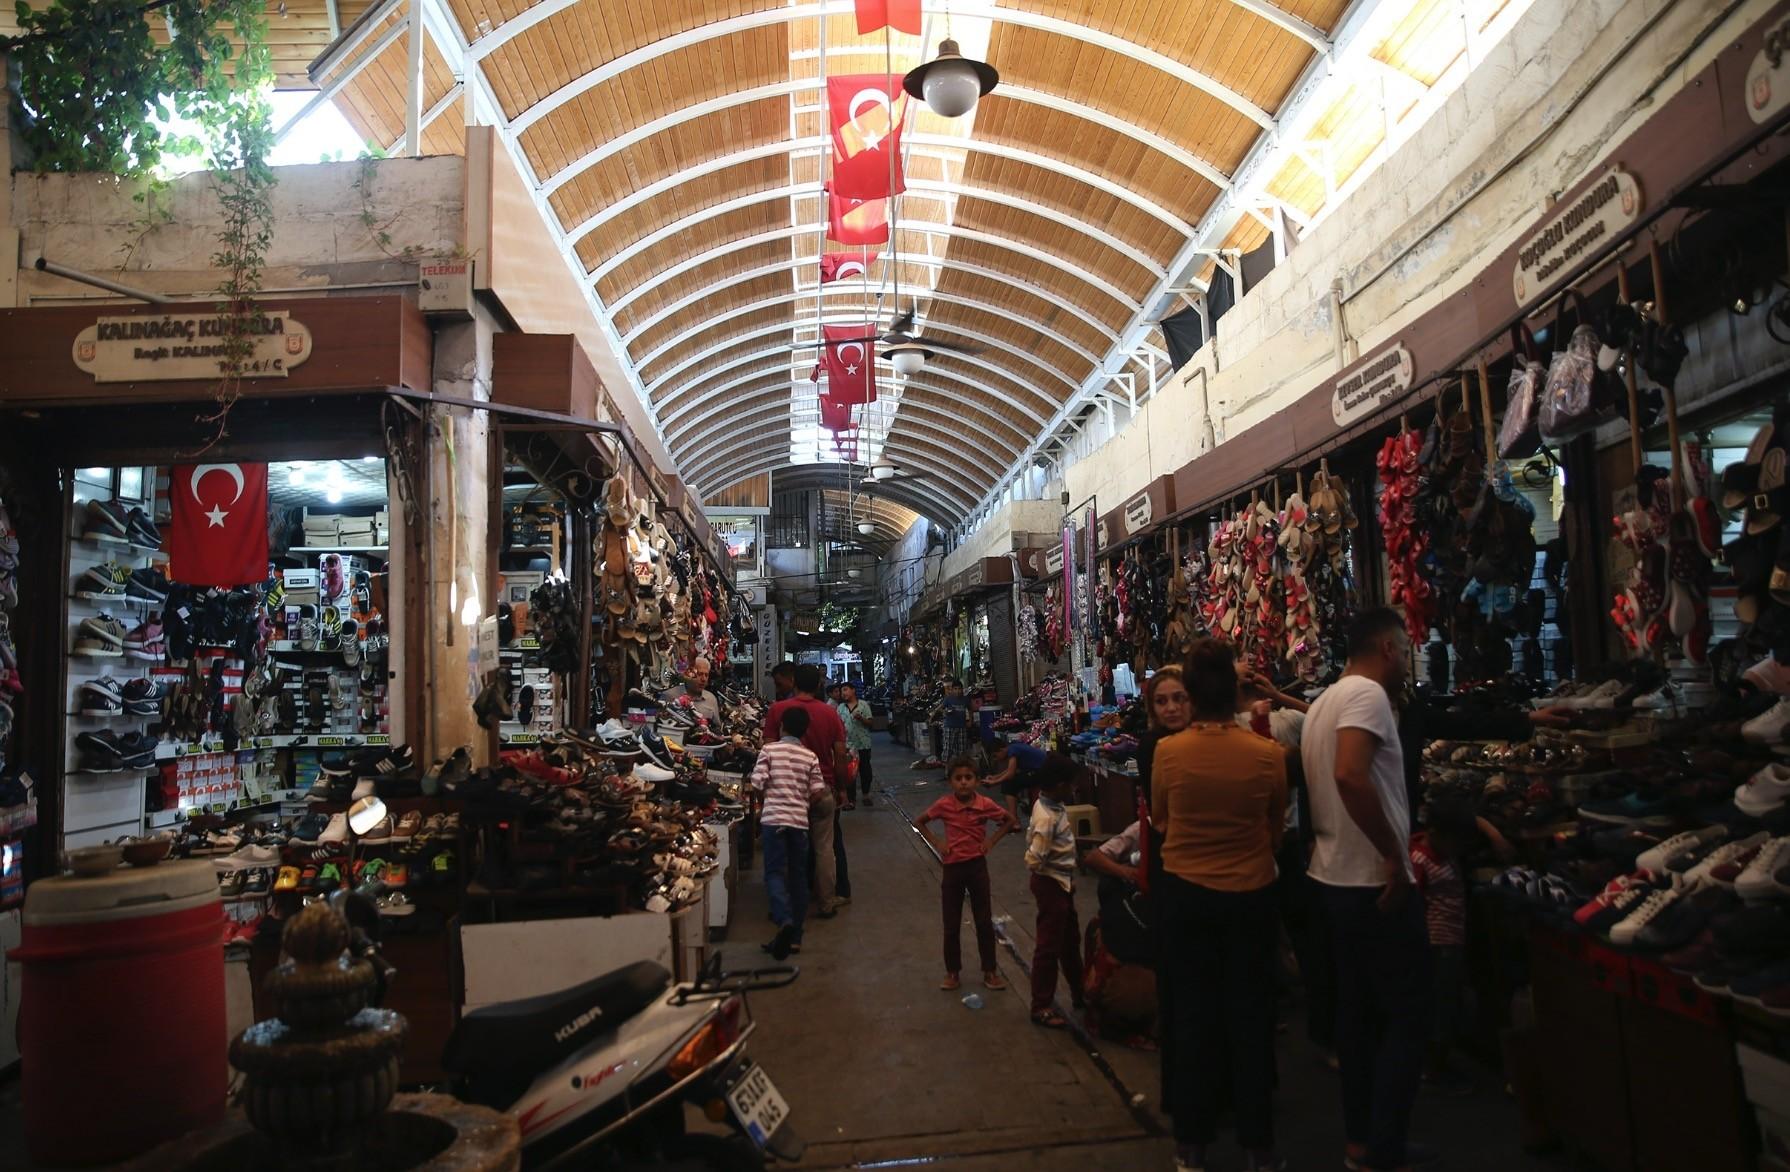 u015eanlu0131urfau2019s Historic Grand Bazaar offers a wide variety of shopping choices.